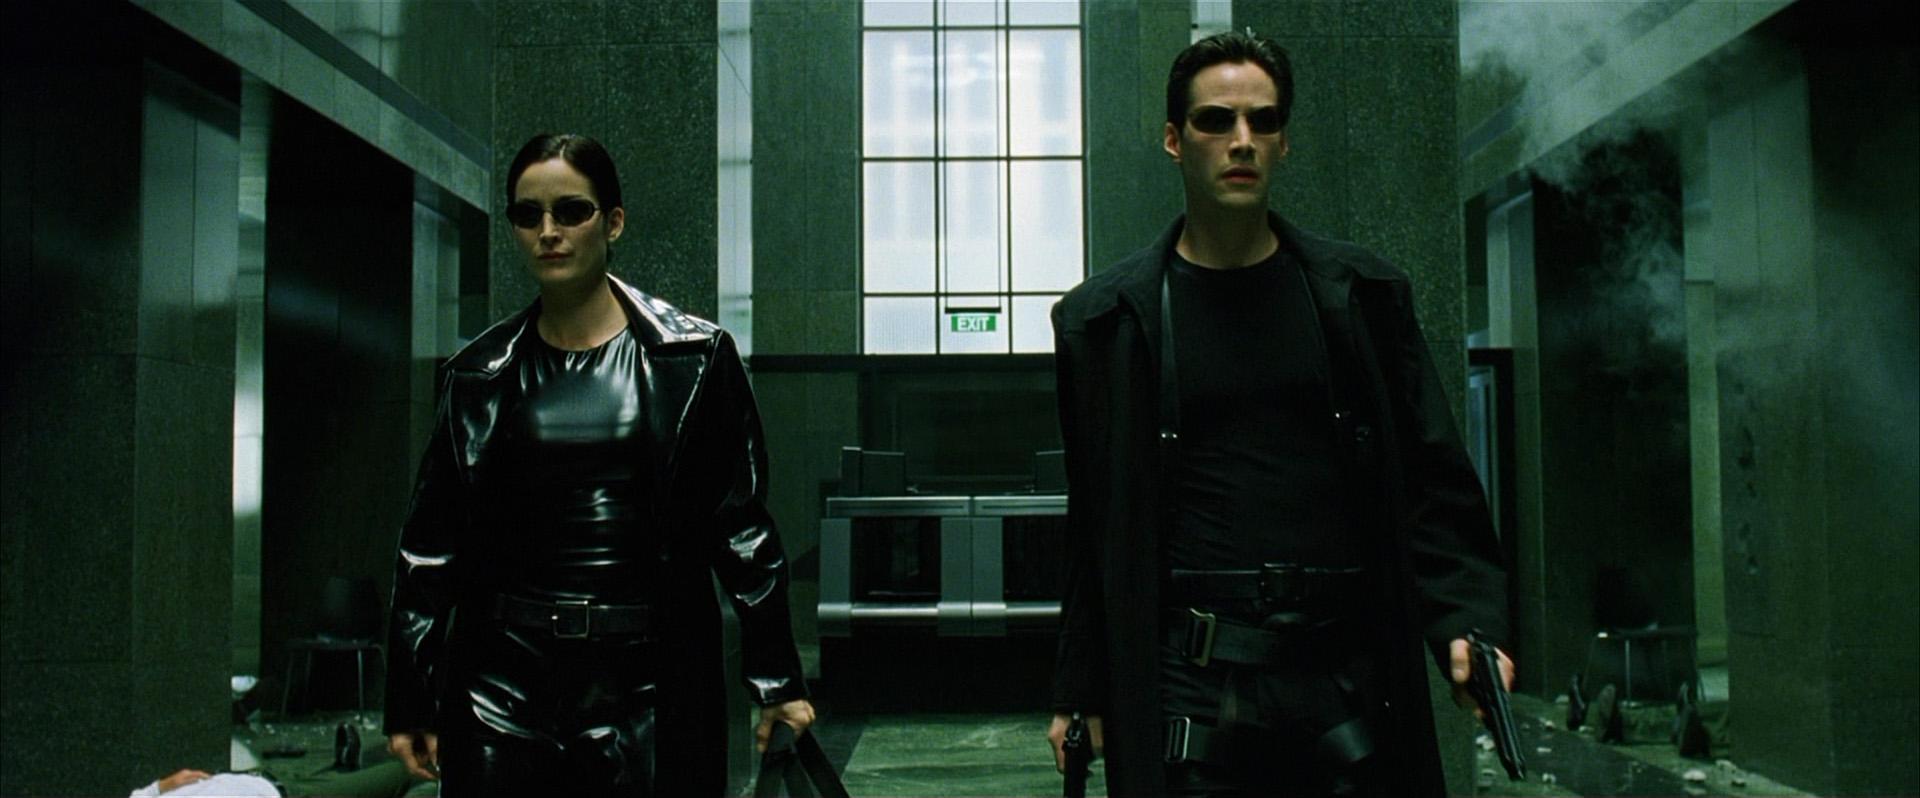 Image result for the matrix movie pics